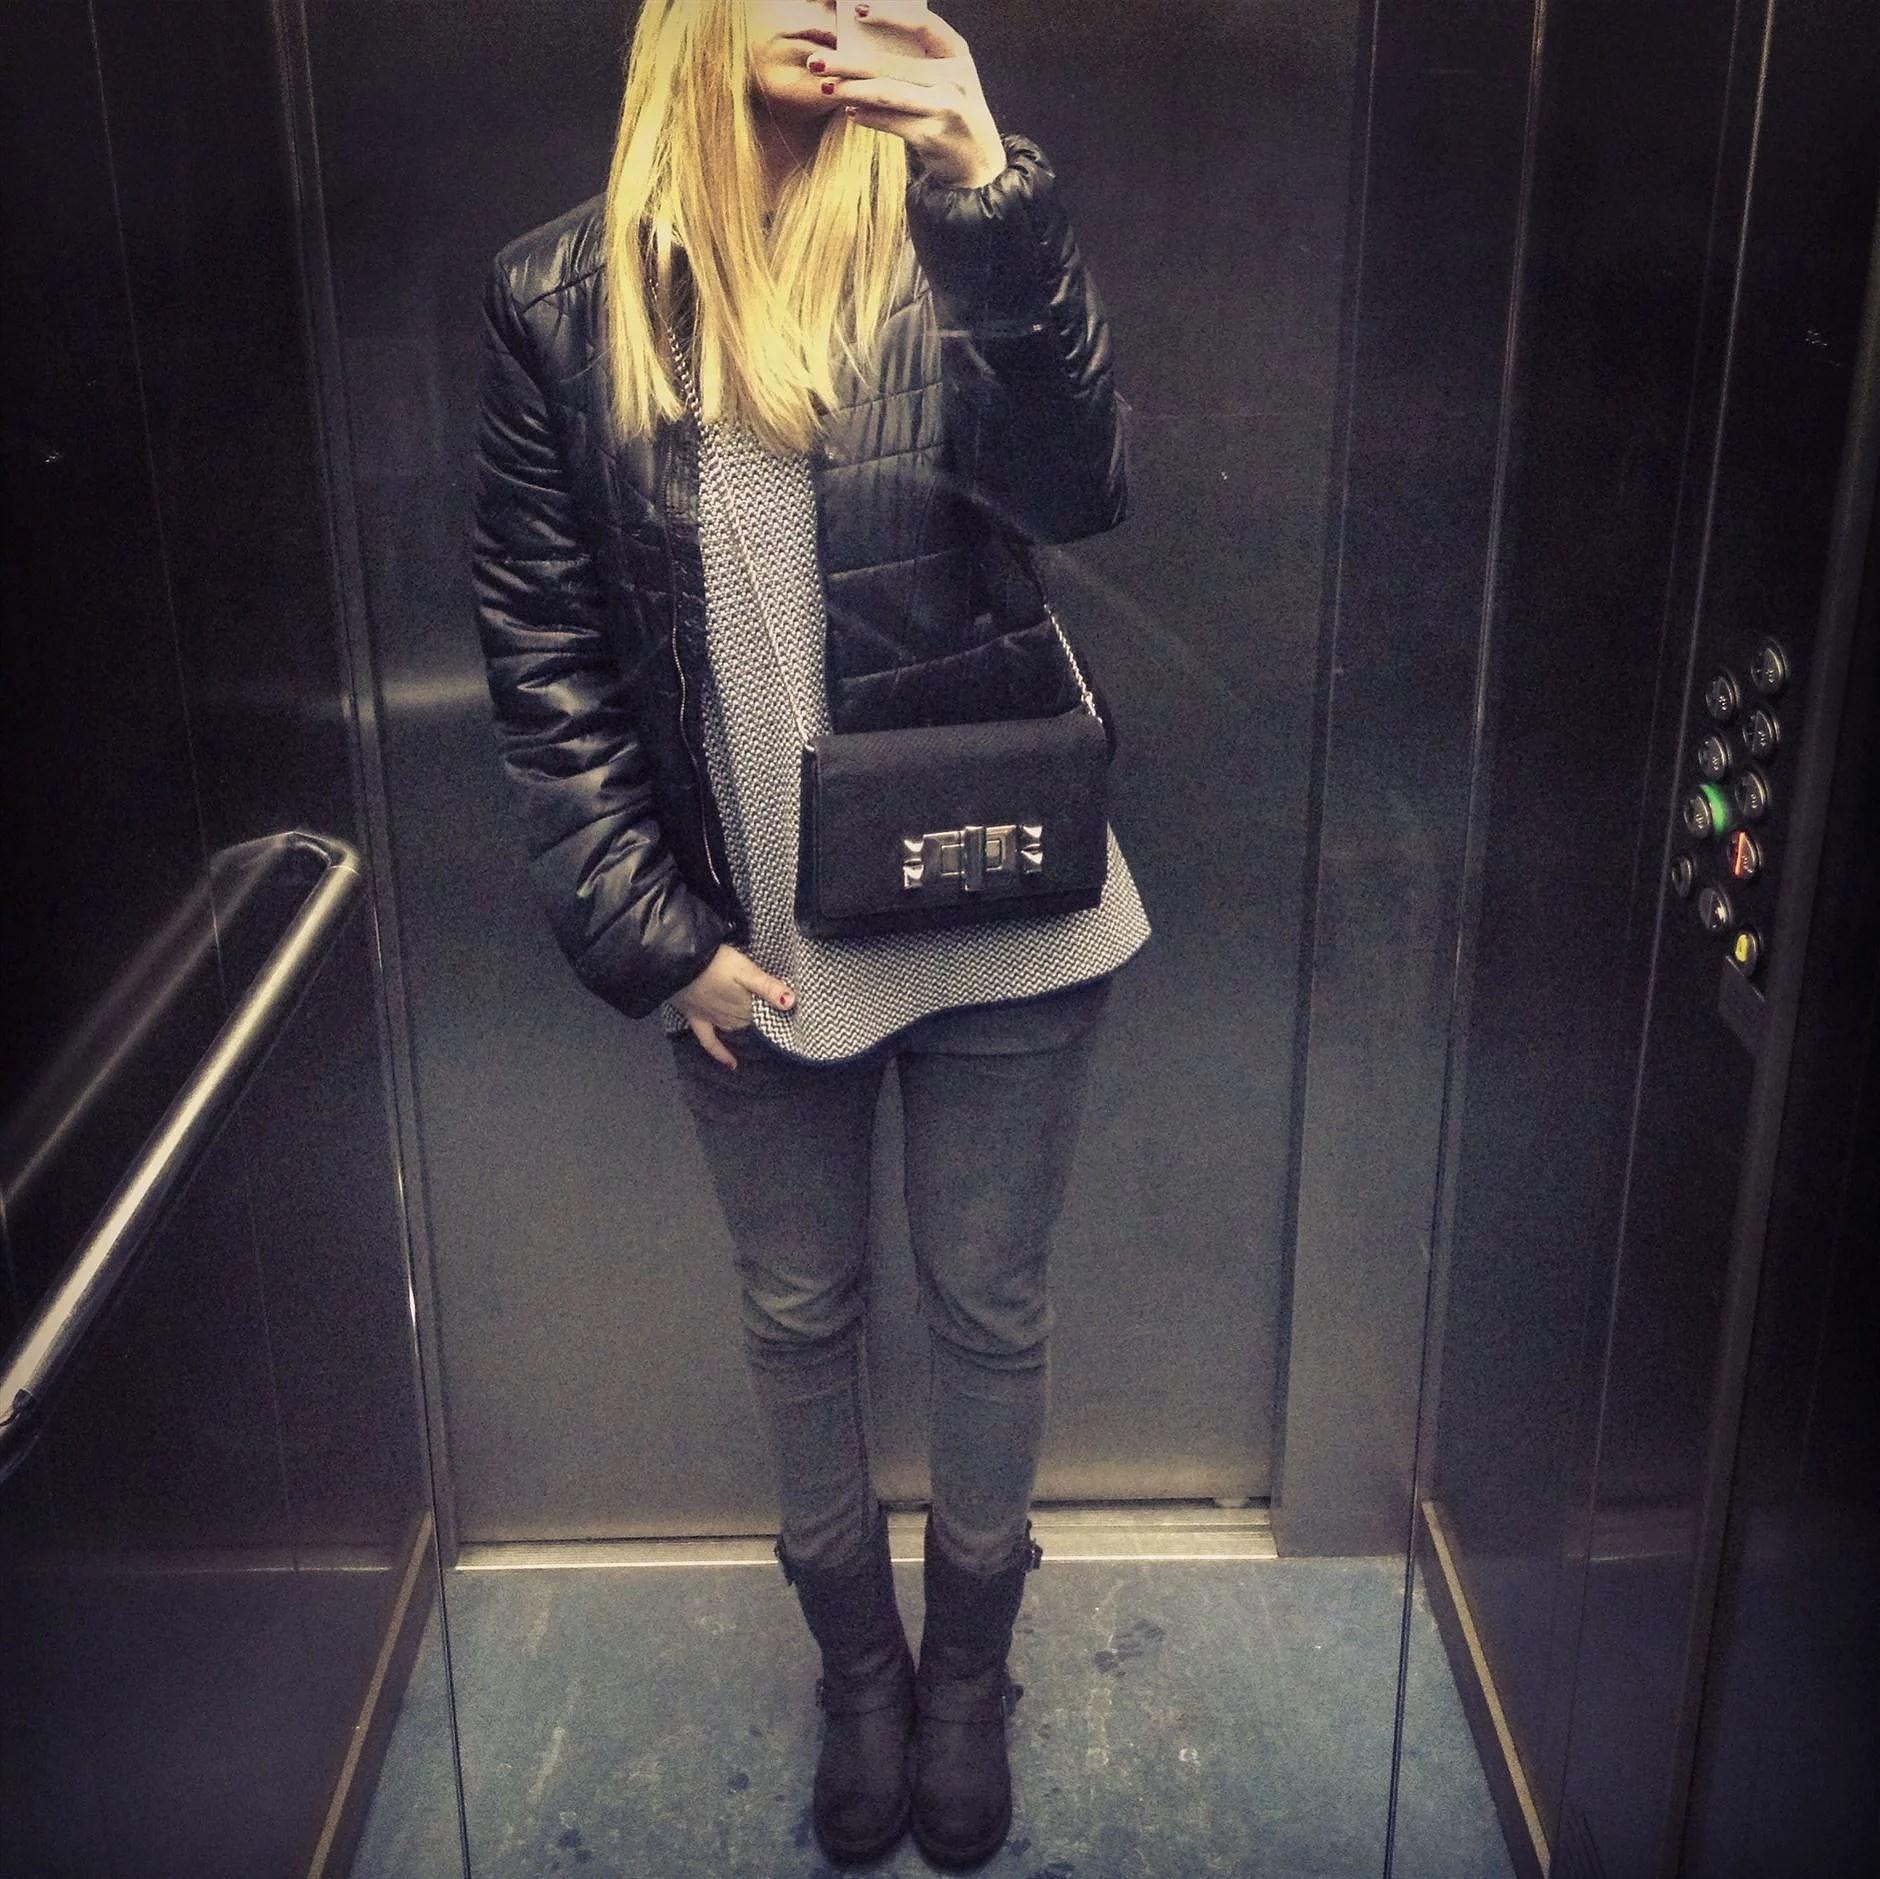 The elevator look